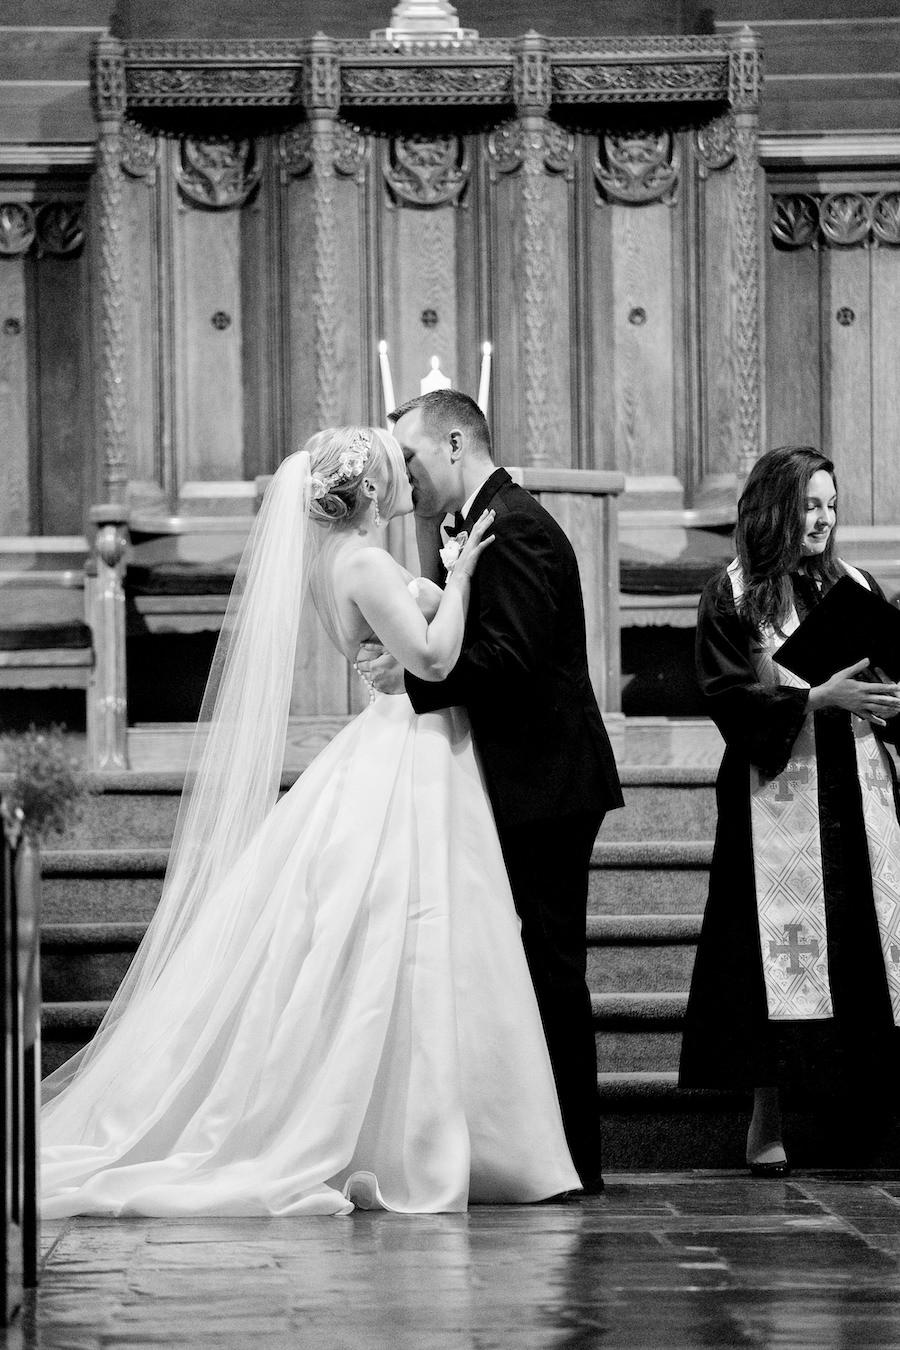 A bride and groom sharing their first kiss during their Kalamazoo, Michigan wedding